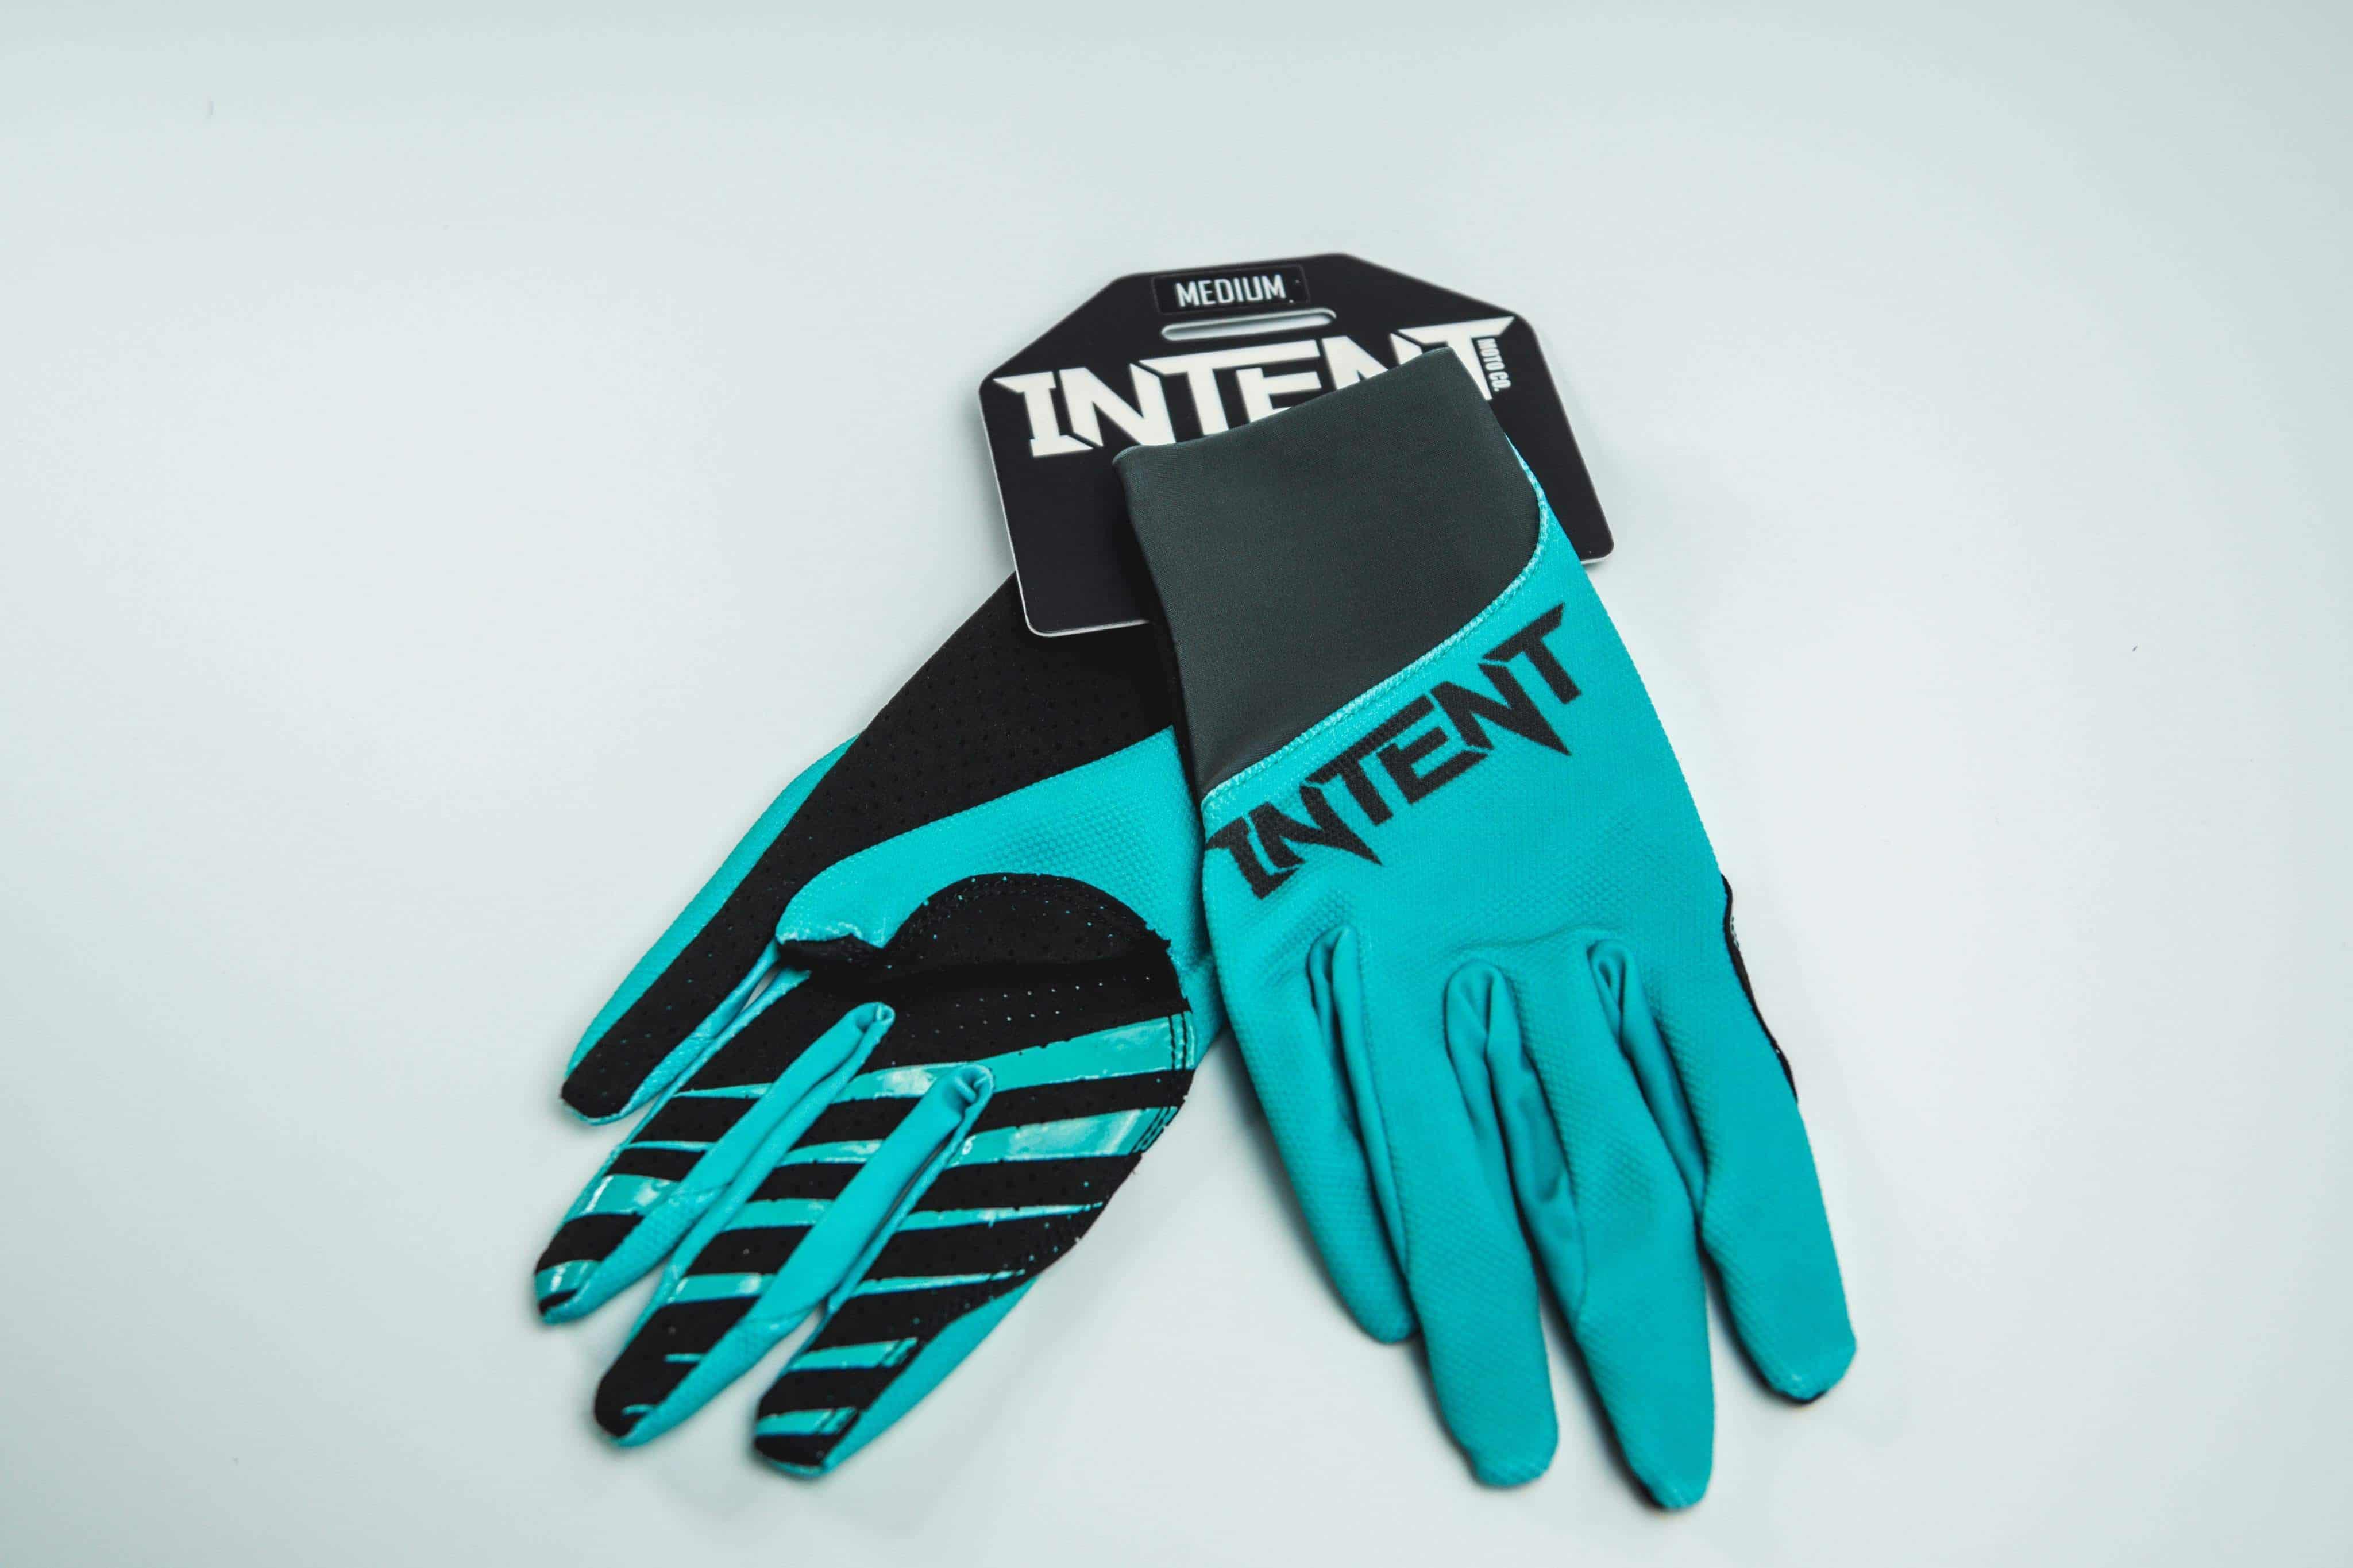 Intent Mx Legacy Glove – Teal/Grey